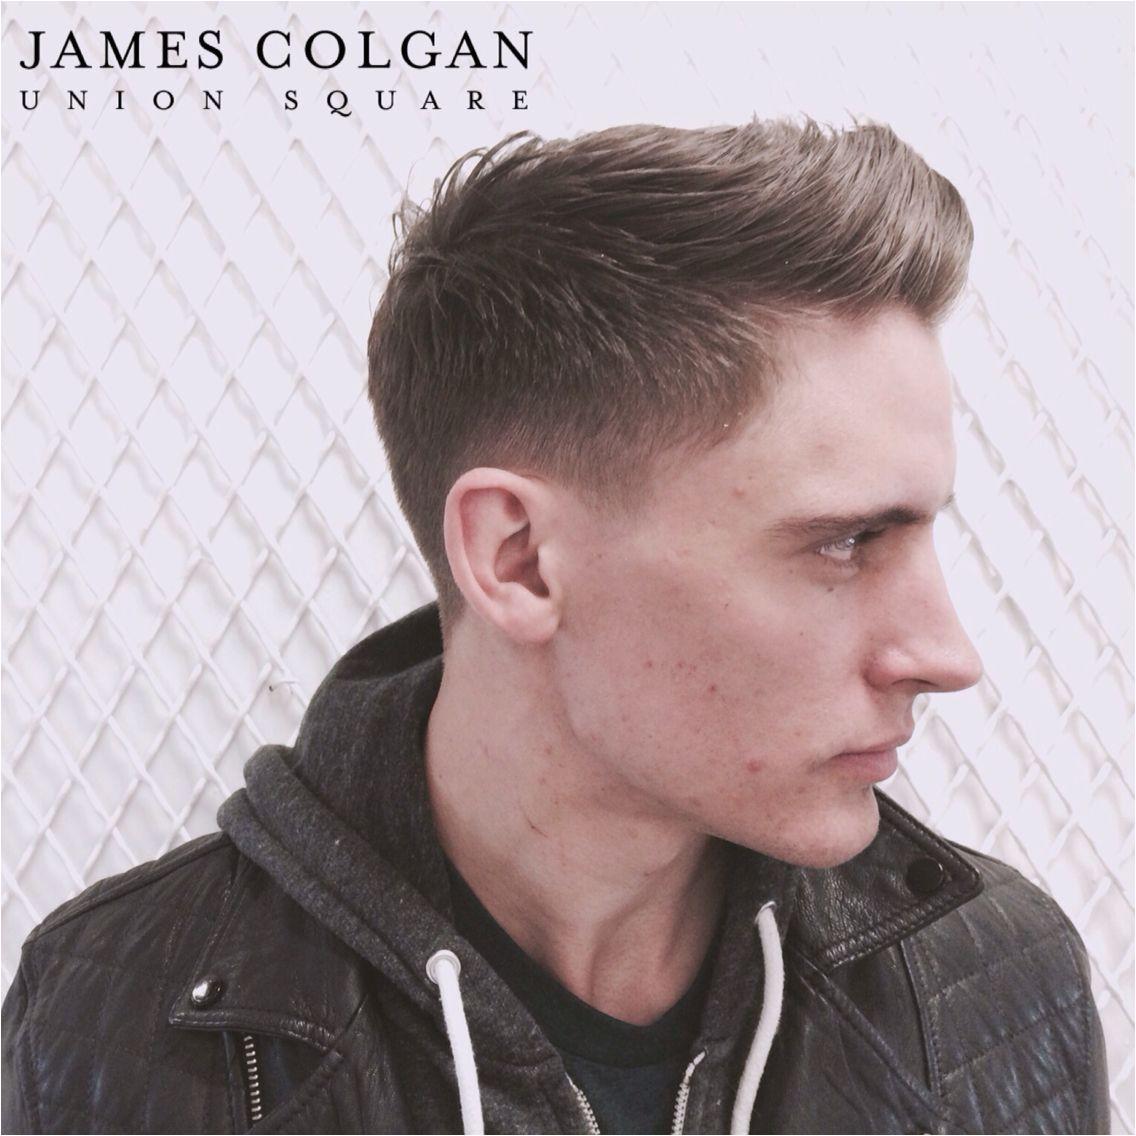 Haircuts Union Square James Colgan Union Square Jamescolgansf On Pinterest